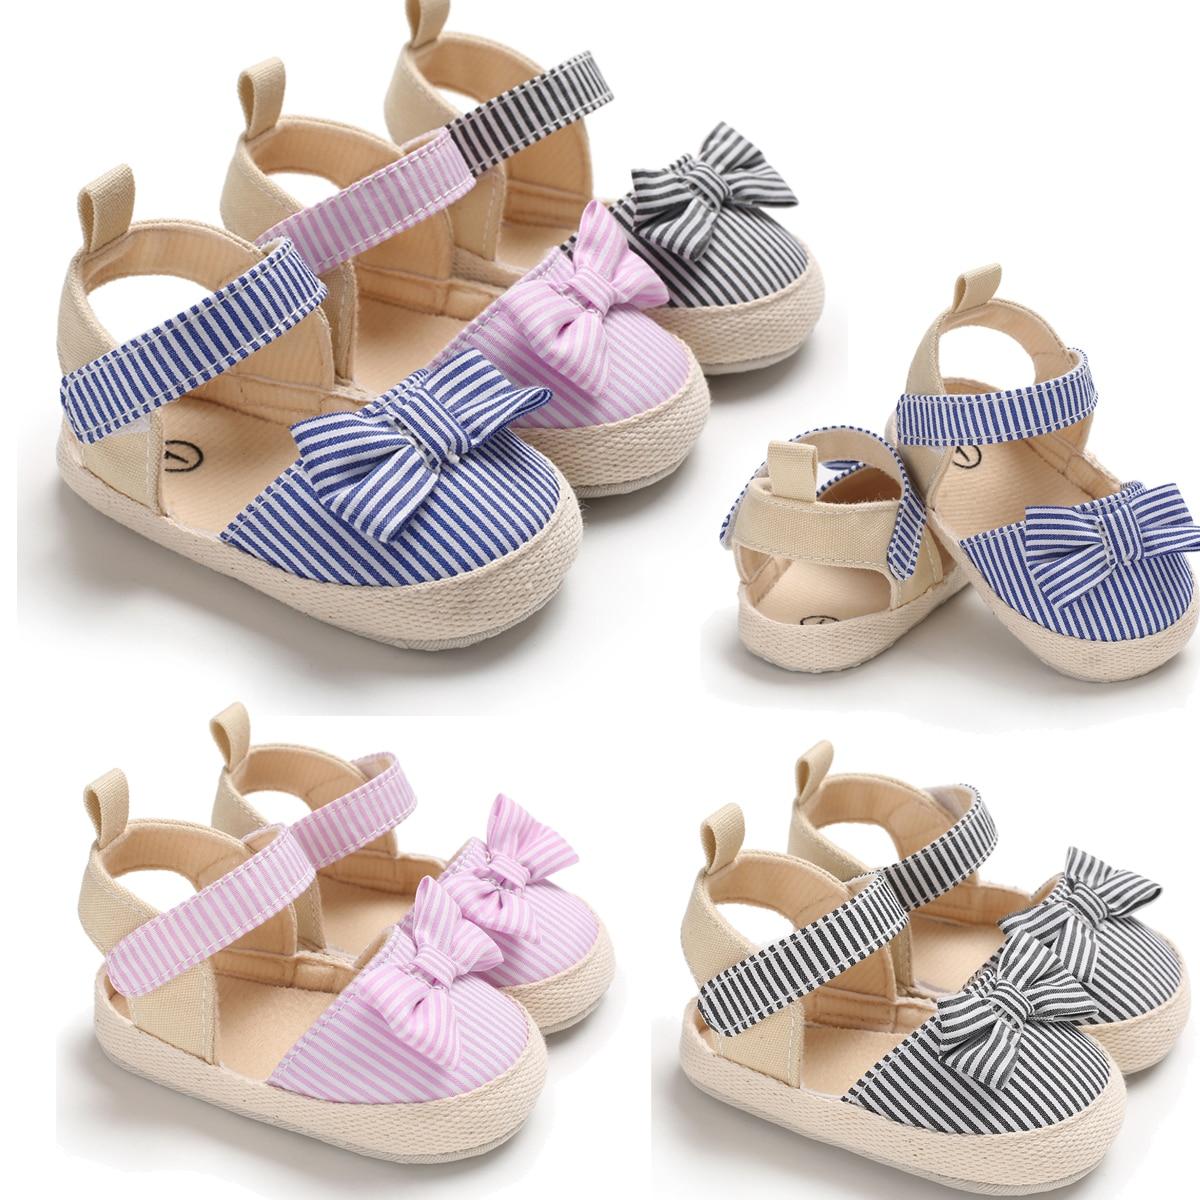 Pudcoco 0-18Months Newest Newborn Infants Baby Girl Shoes Soft Crib Shoes Canvas Sandals Clogs Anti-slip Sneaker Prewalker 0-18M